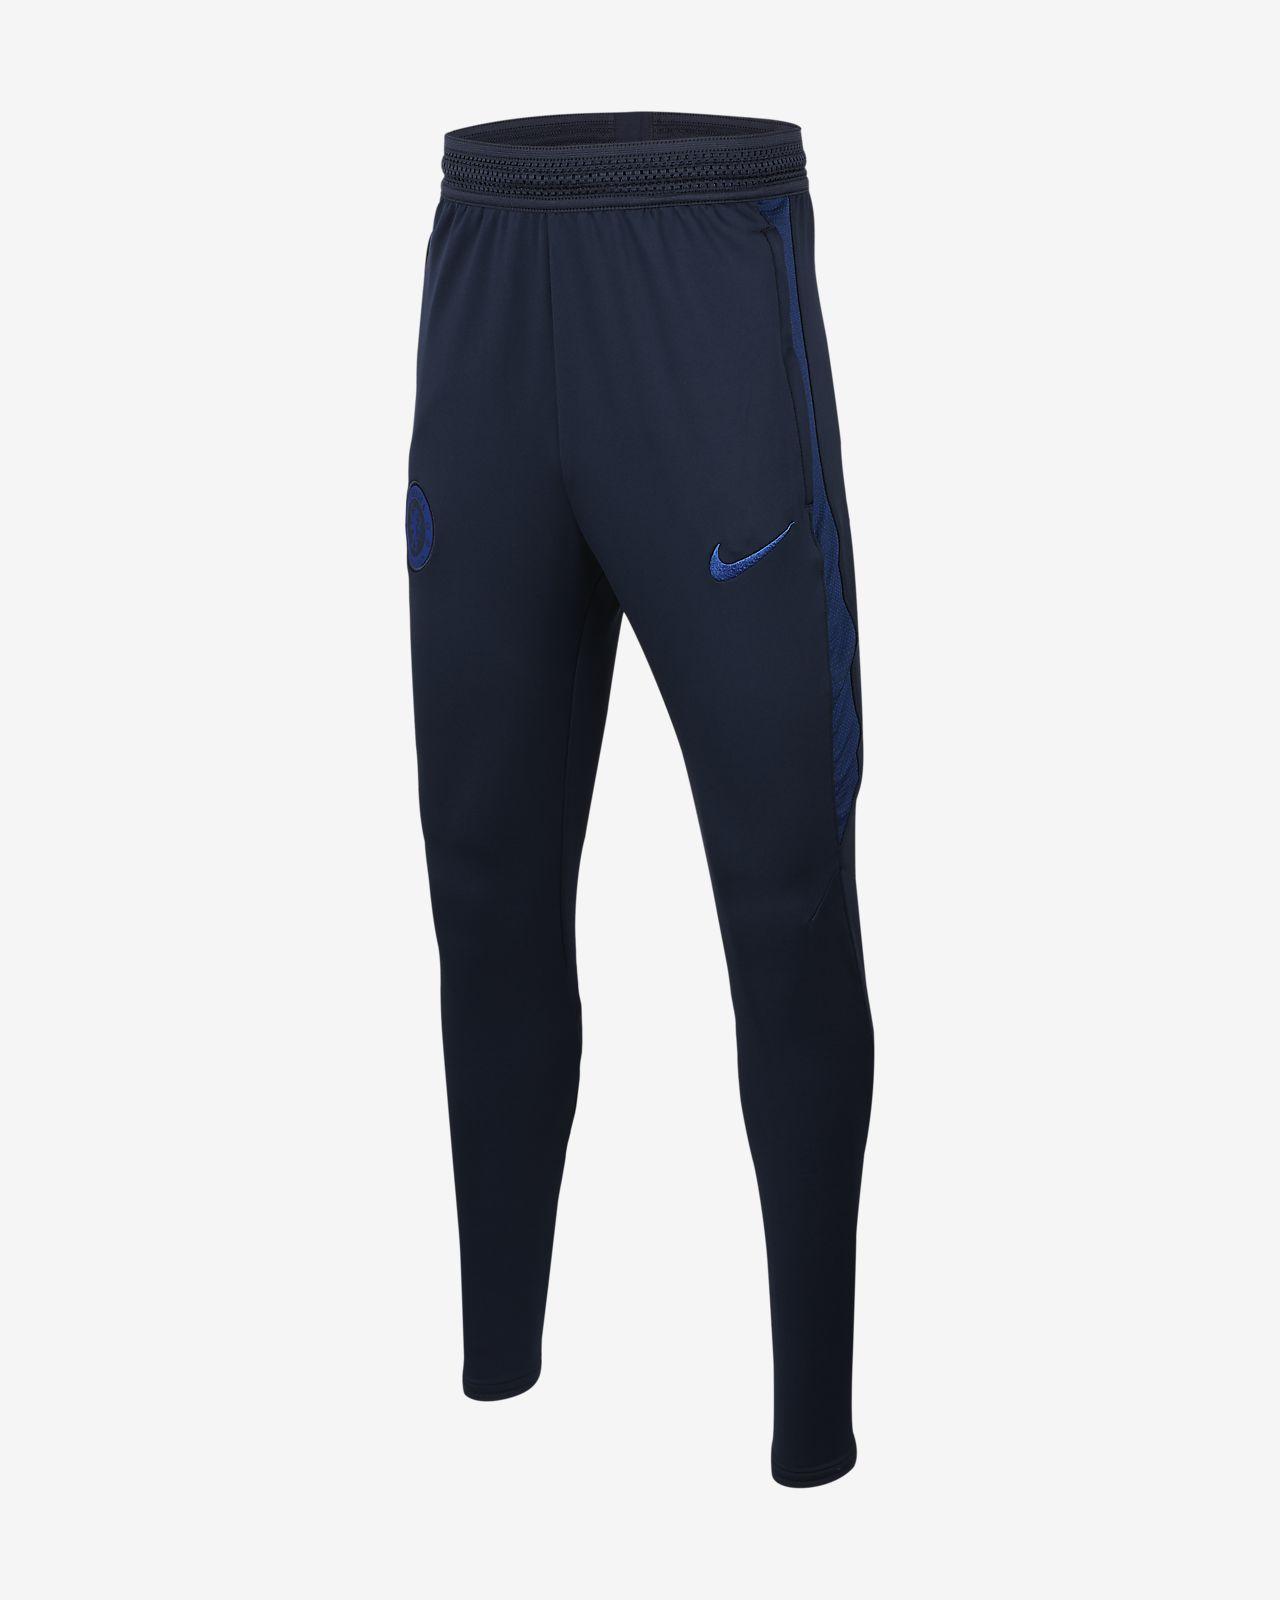 Nike Dri-FIT Chelsea FC Strike Kinder-Fußballhose